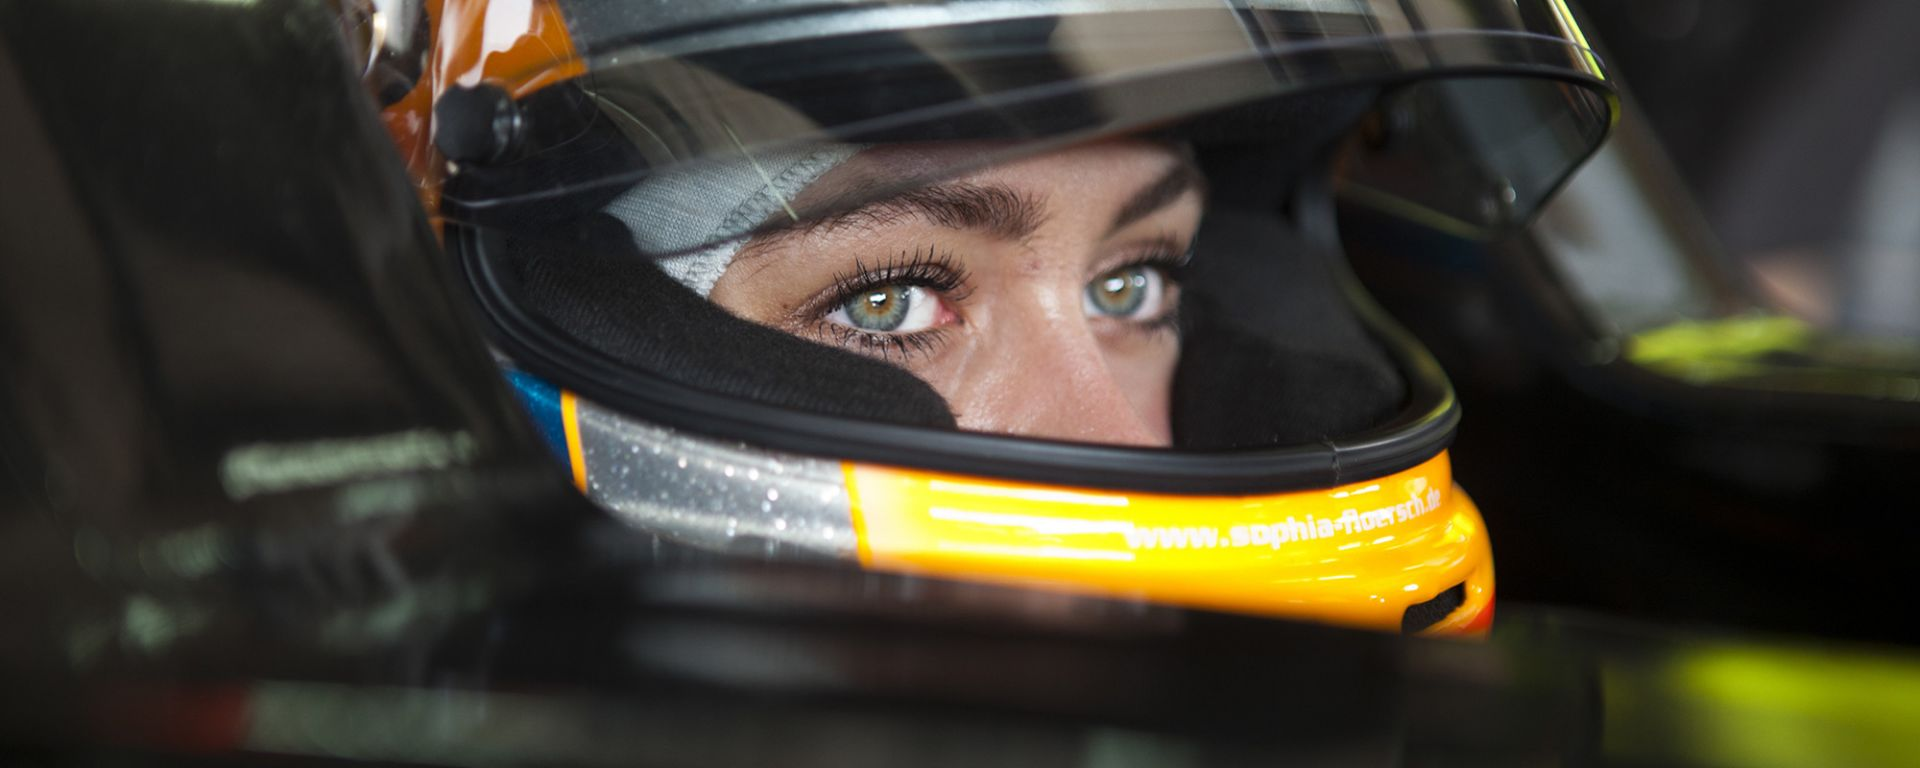 F3 Regional, Sophia Floersch a Imola